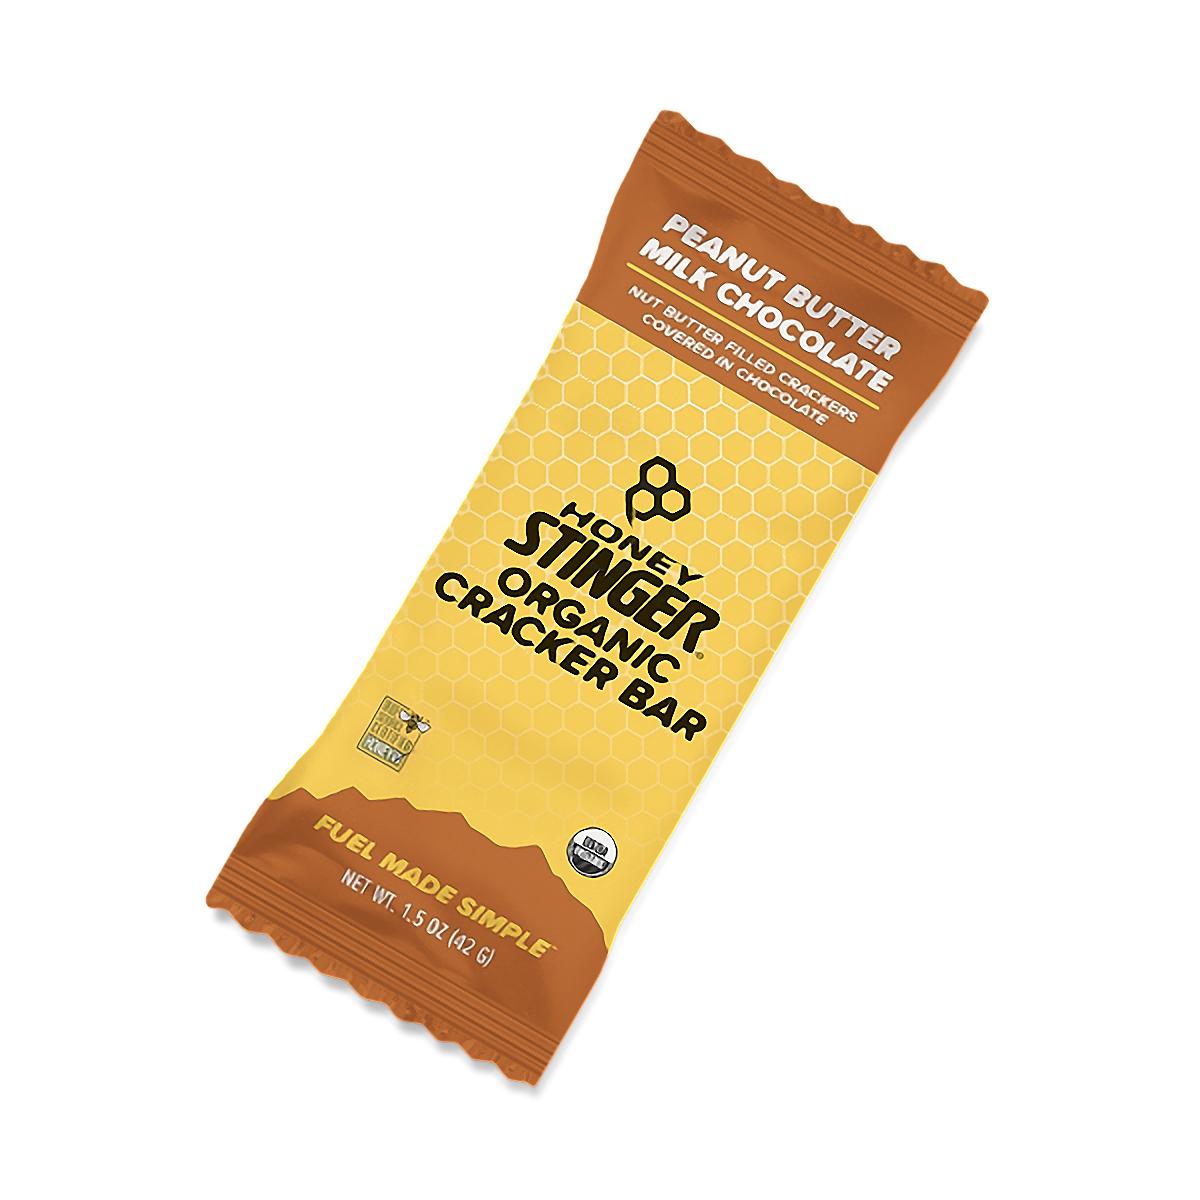 Honey Stinger Organic Cracker Bar - Flavor: Peanut Butter Milk Chocolate - Size: Box of 12, Peanut Butter Milk Chocolate, large, image 1